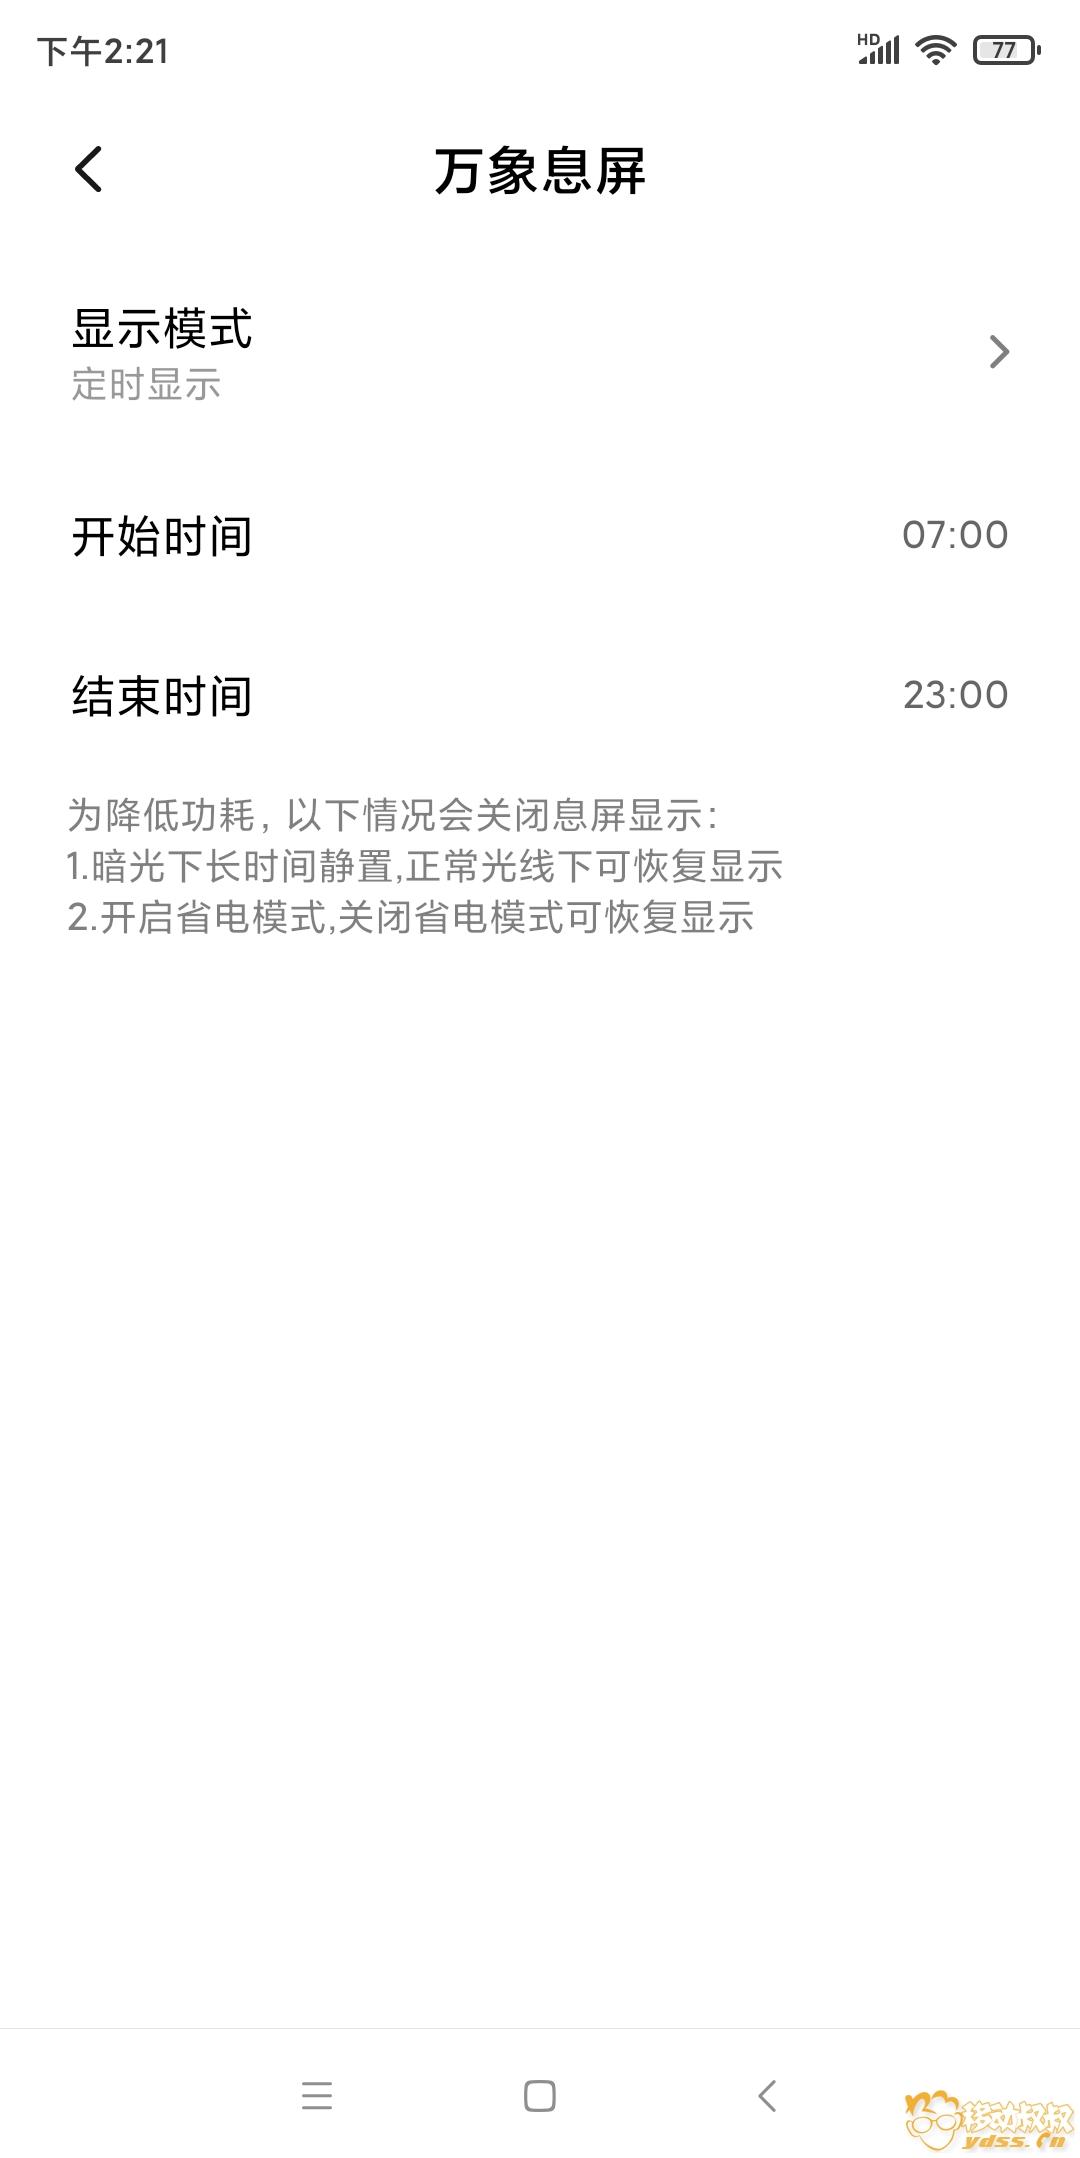 Screenshot_2019-11-13-14-21-12-924_com.miui.aod.jpg